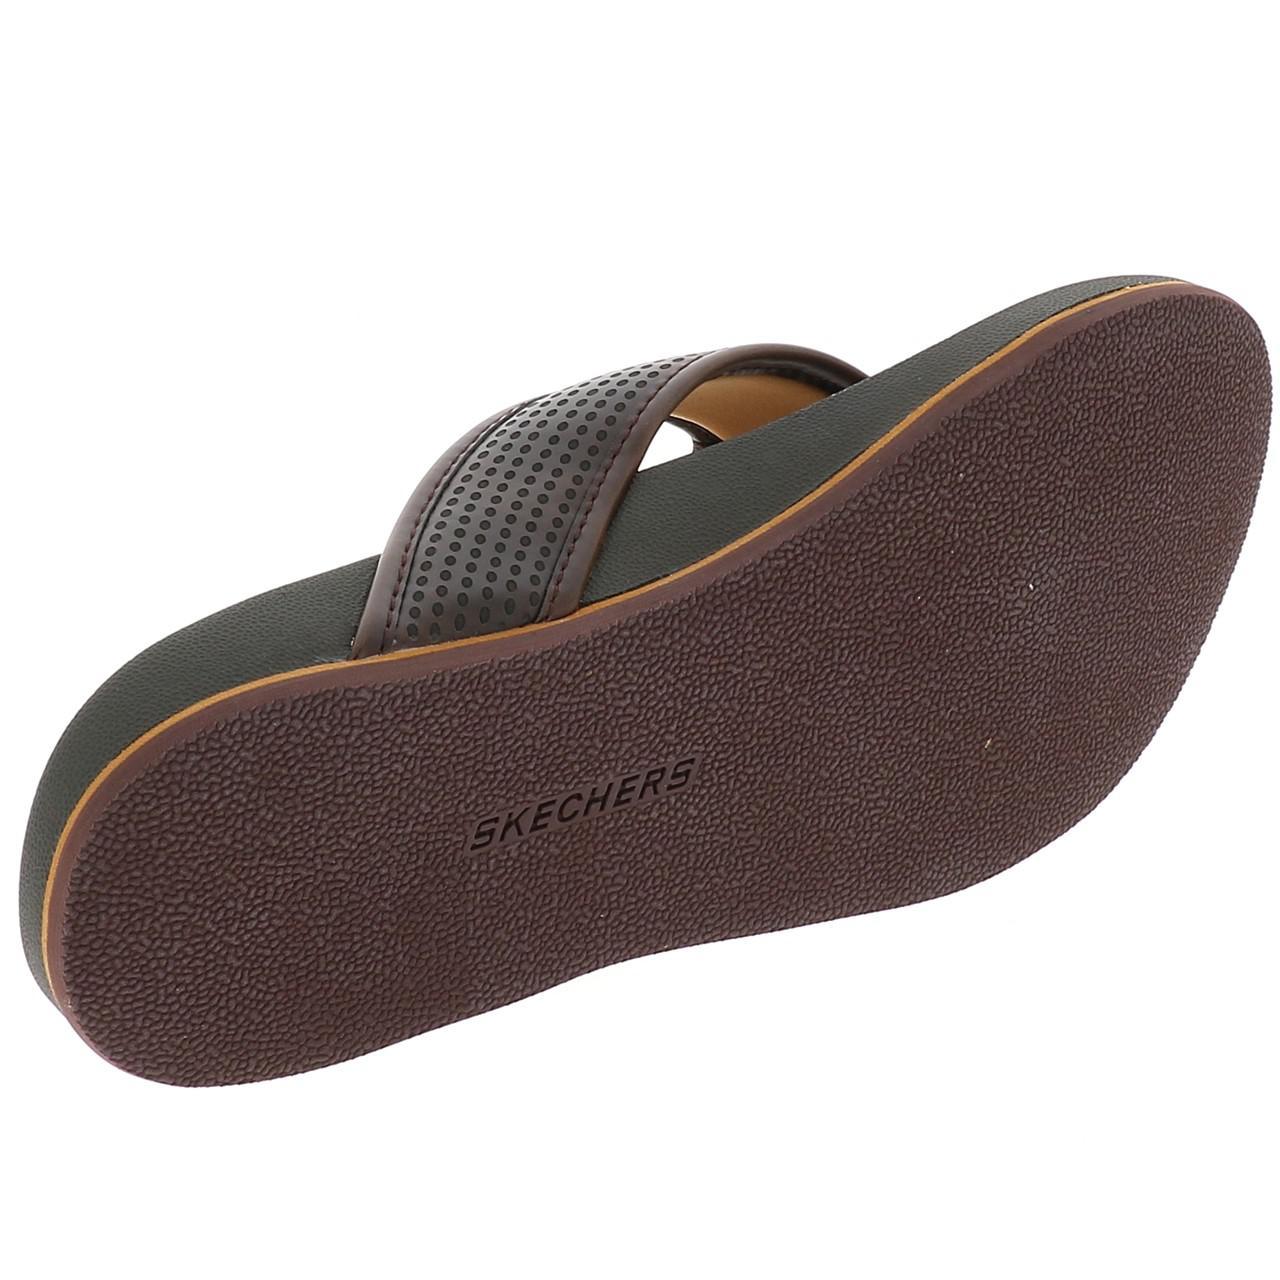 Tongs-claquettes-Skechers-Pelem-emiro-memoire-de-forme-Marron-40663-Neuf miniature 5